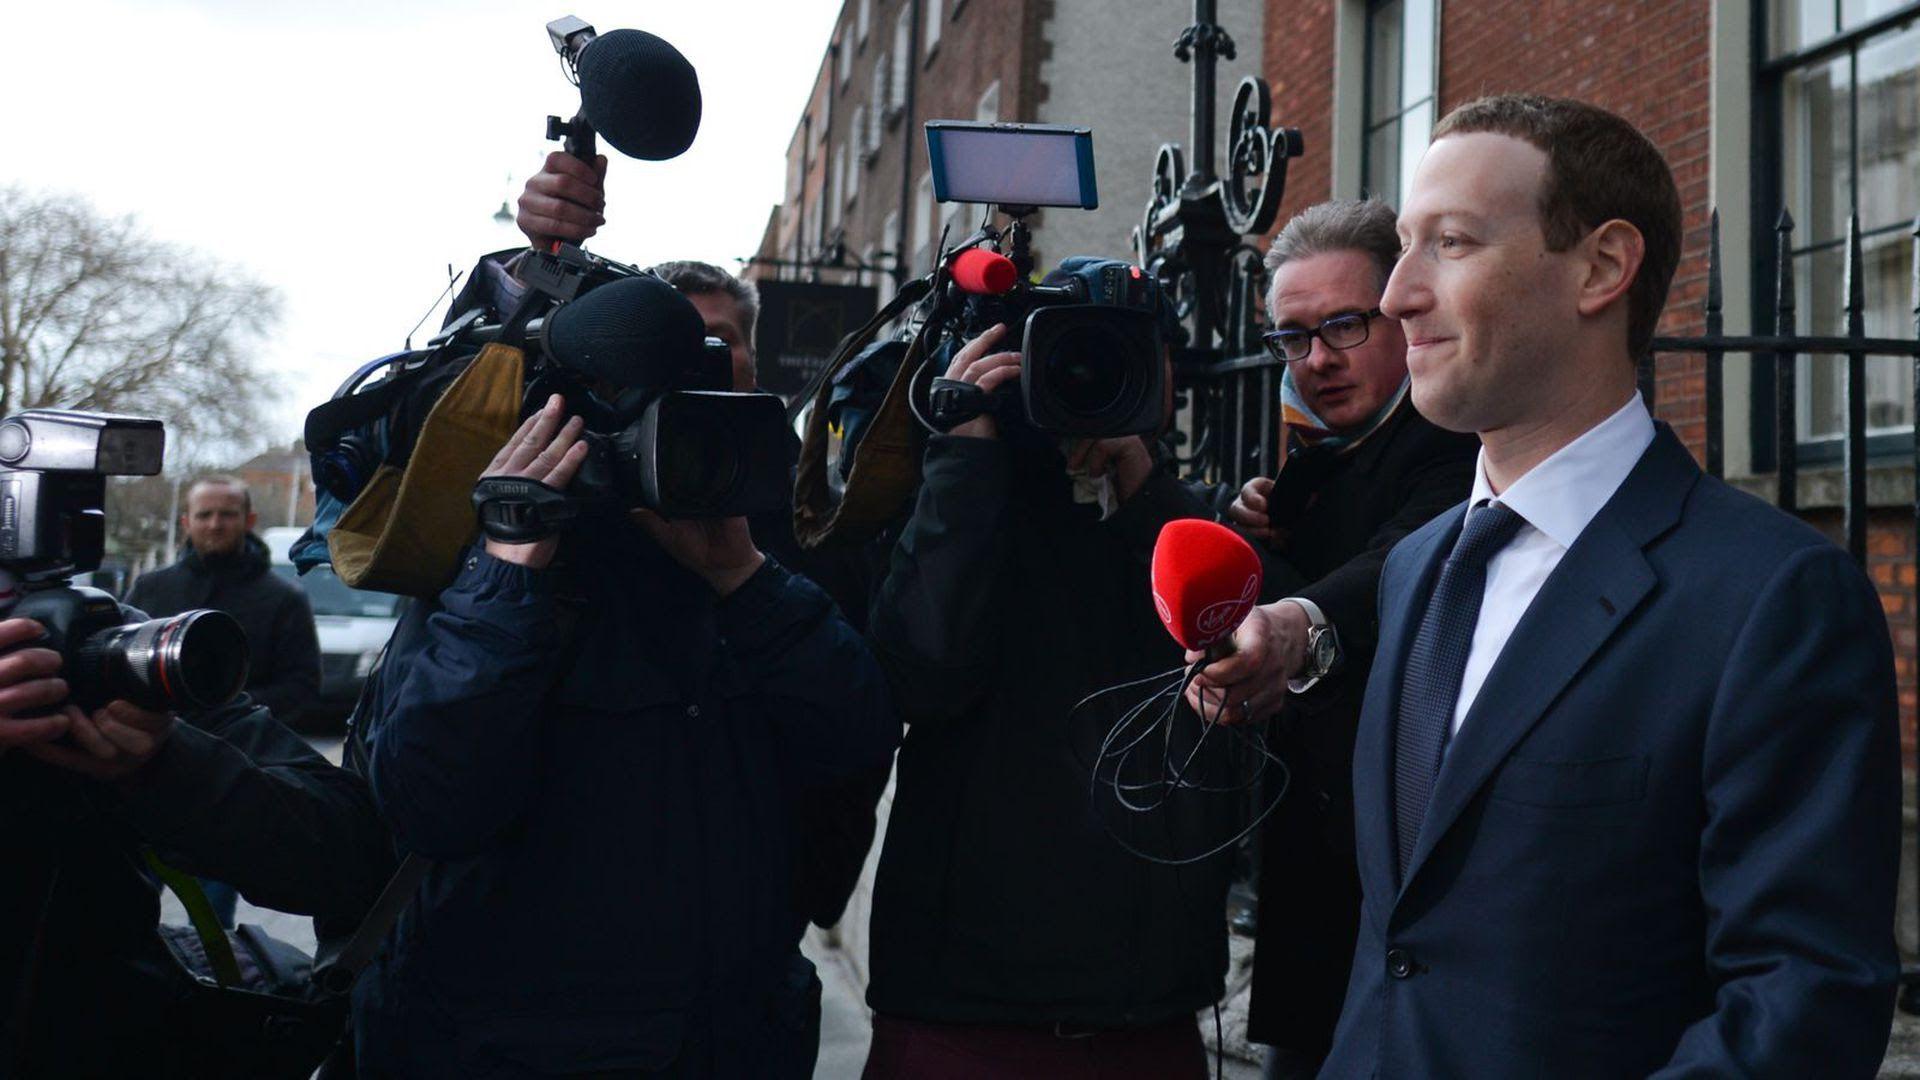 Facebook CEO Mark Zuckerberg. Photo: Artur Widak/NurPhoto via Getty Images